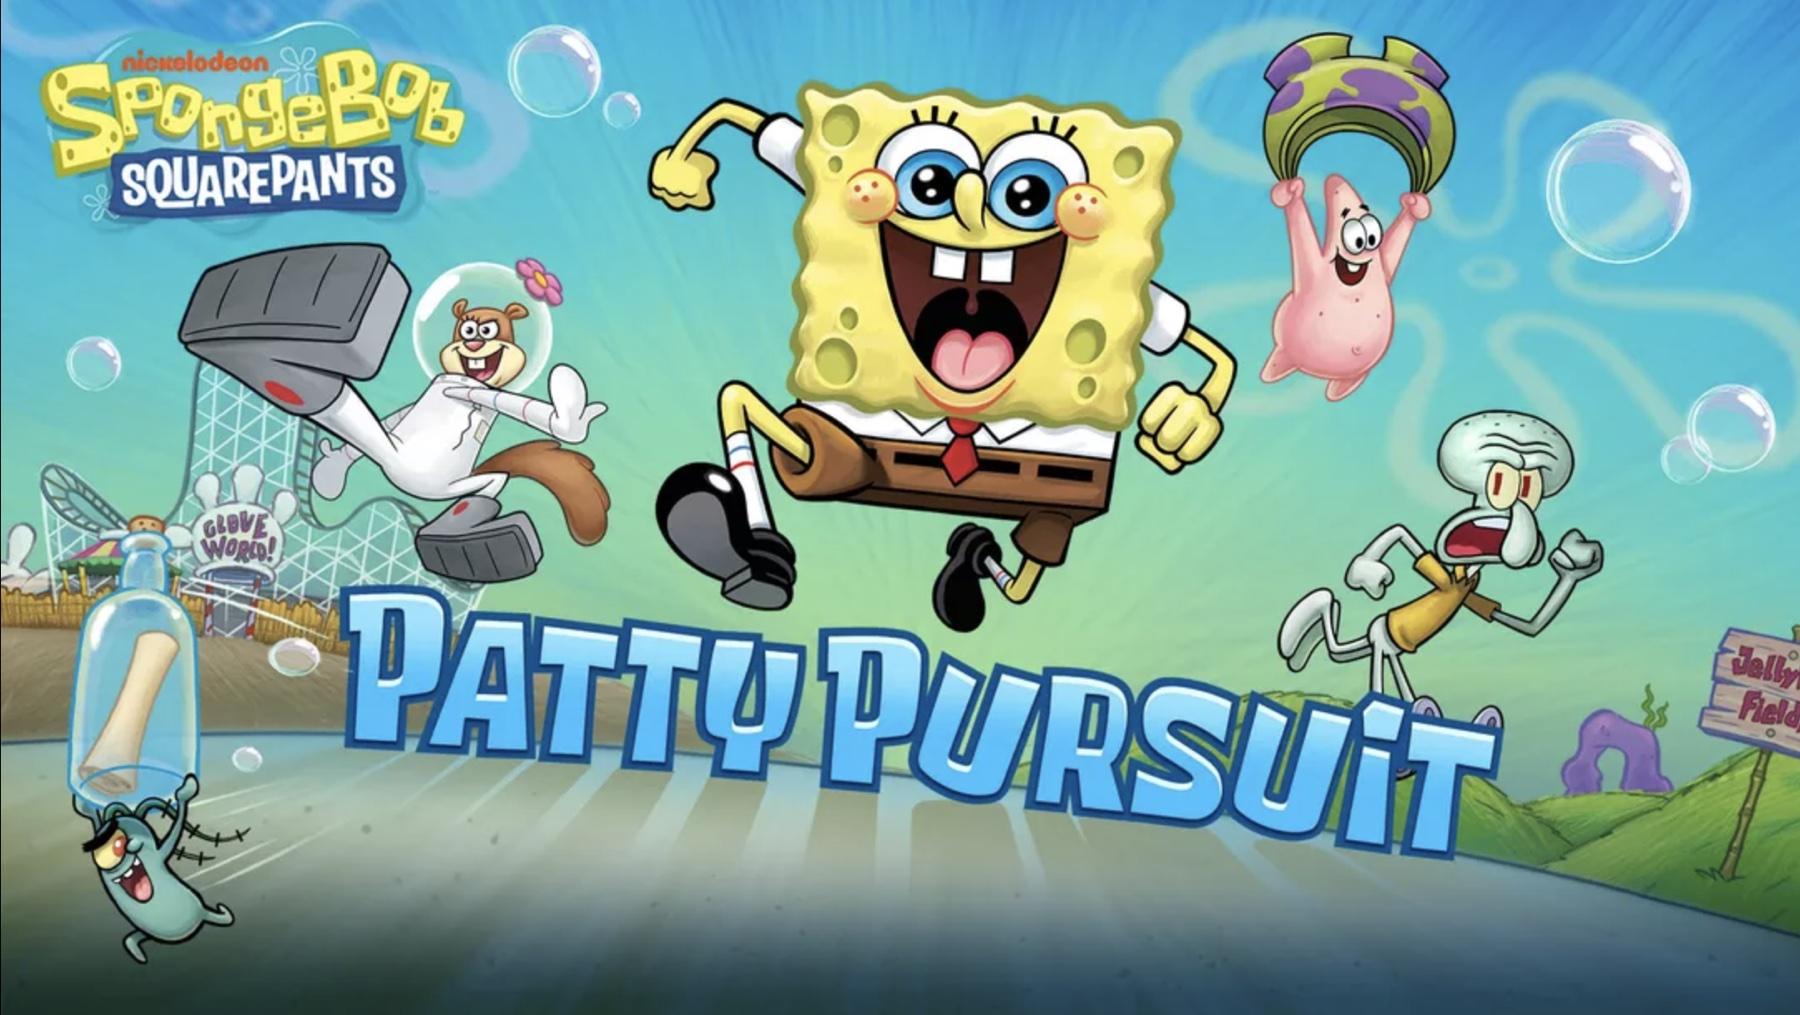 'SpongeBob: Patty Pursuit' Now Available on Apple Arcade